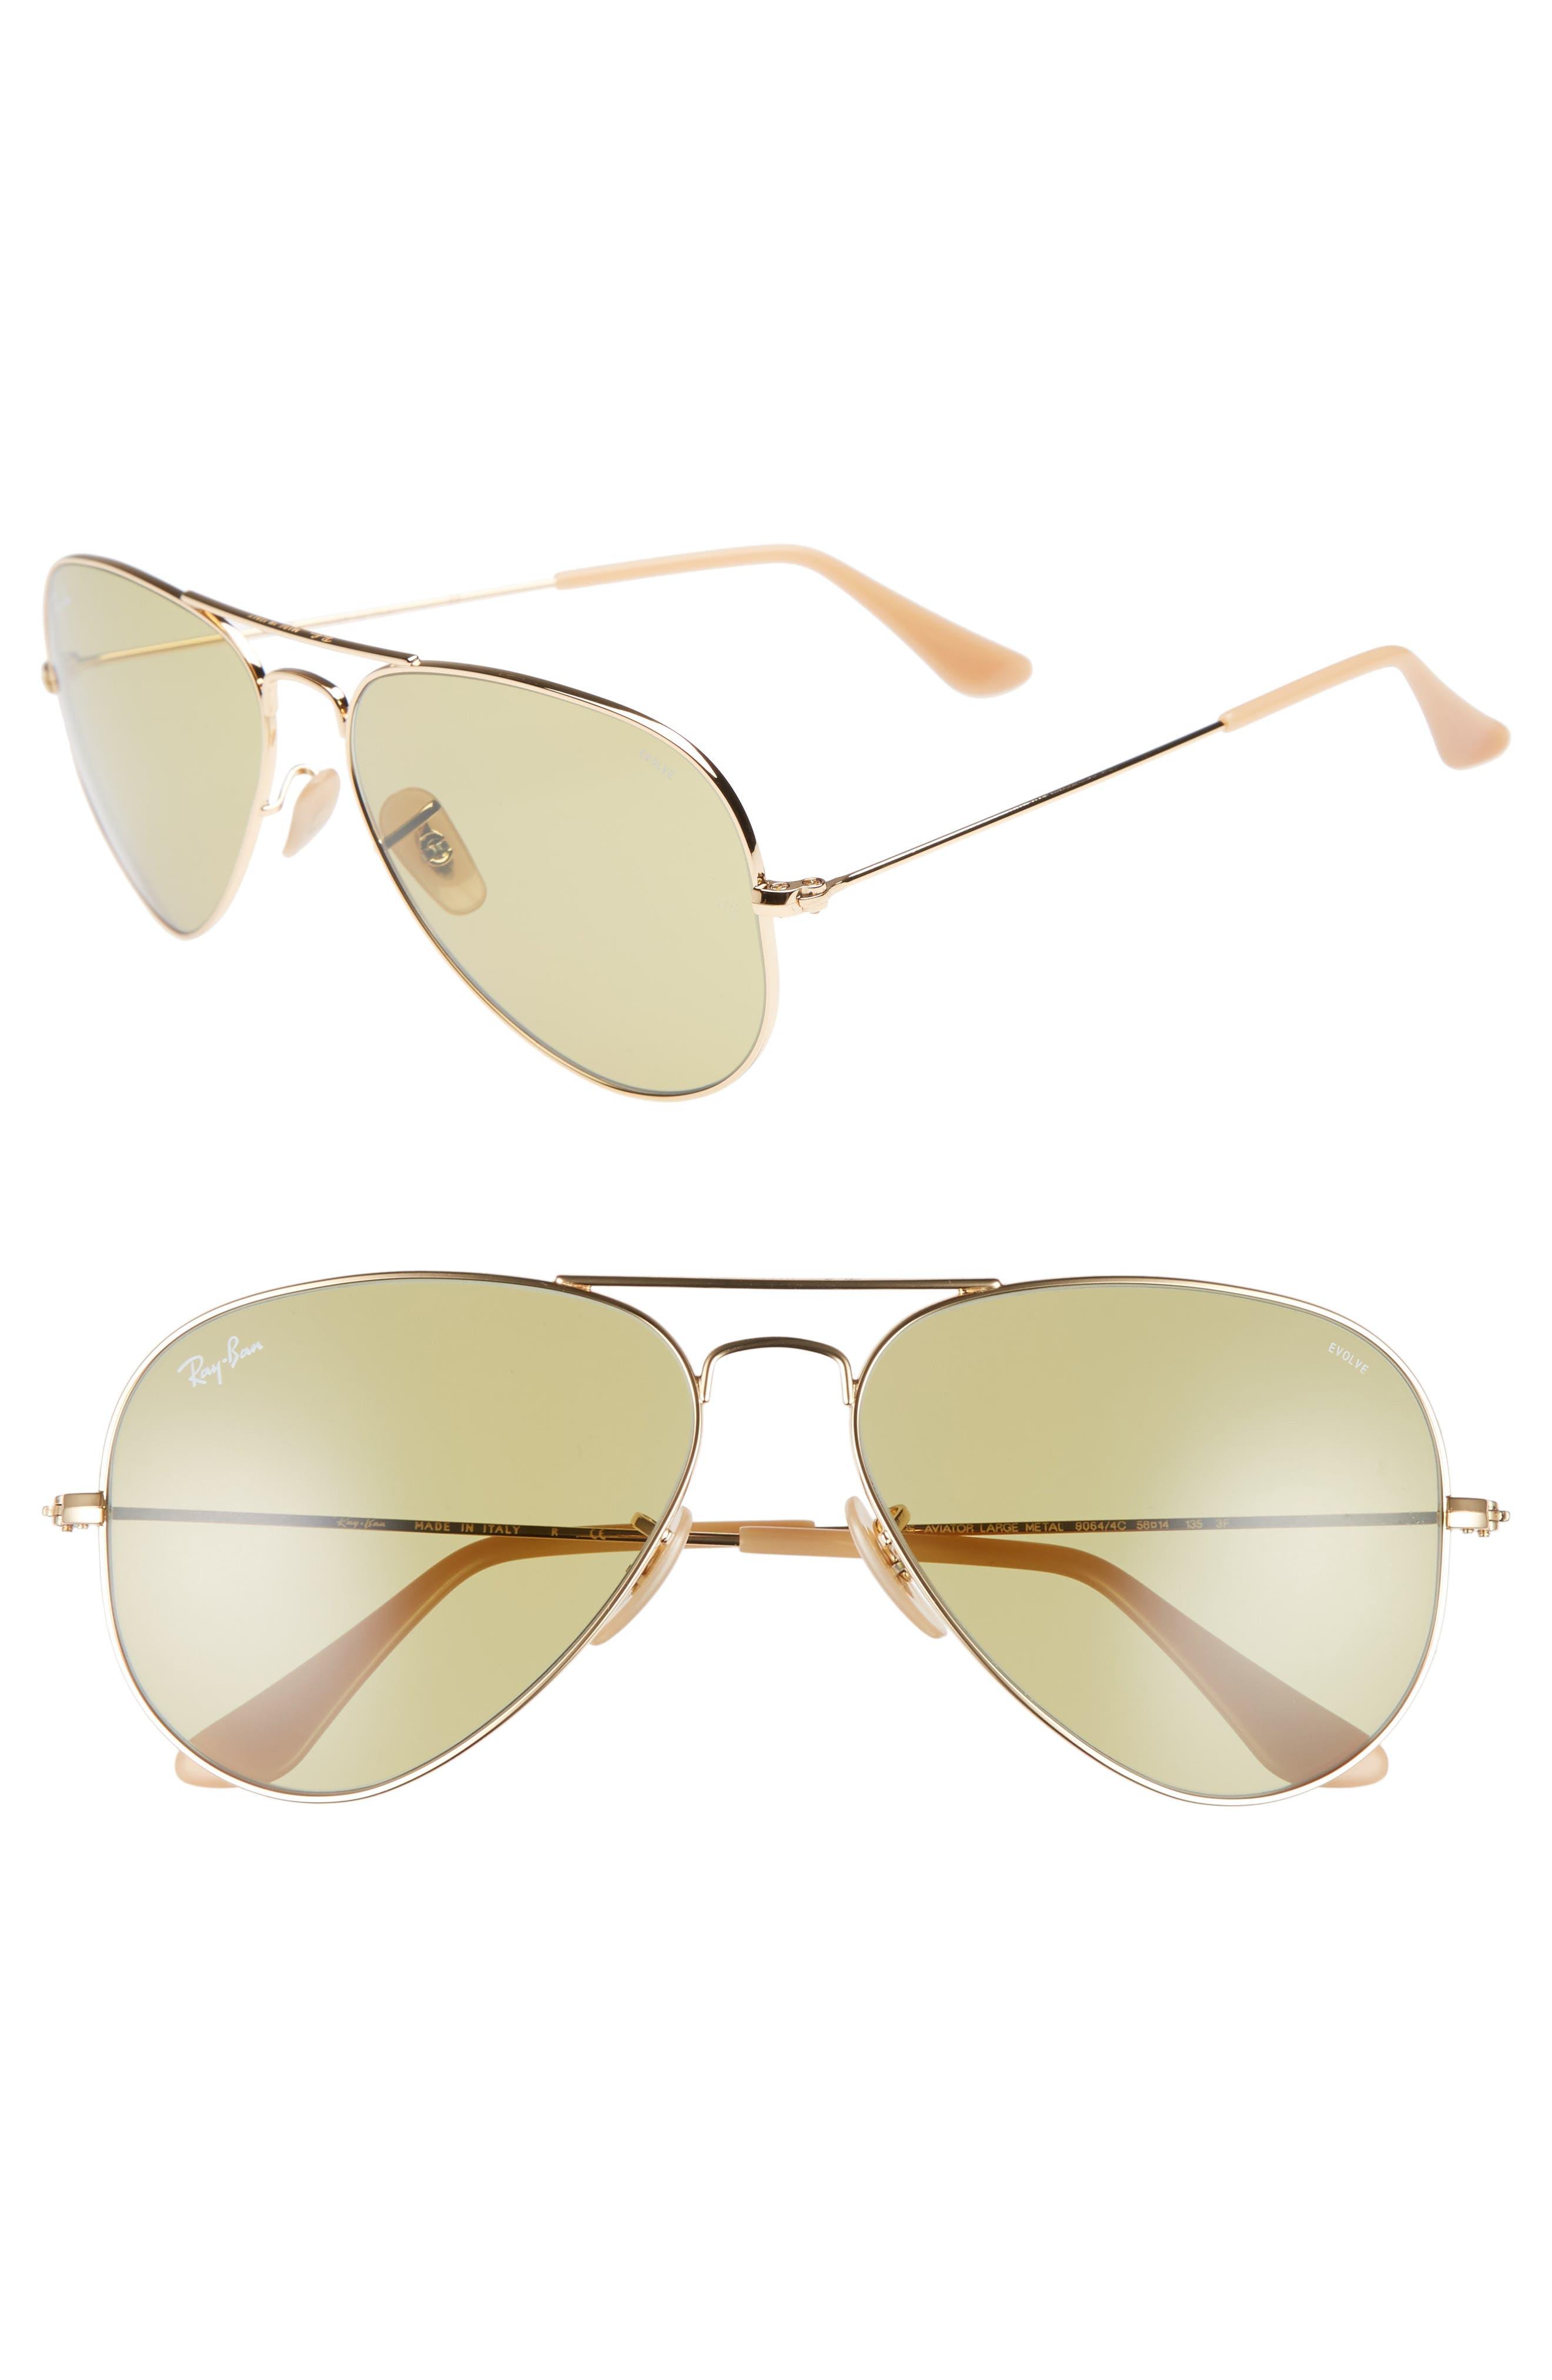 Ray-Ban Evolve 5m Polarized Aviator Sunglasses - Gold